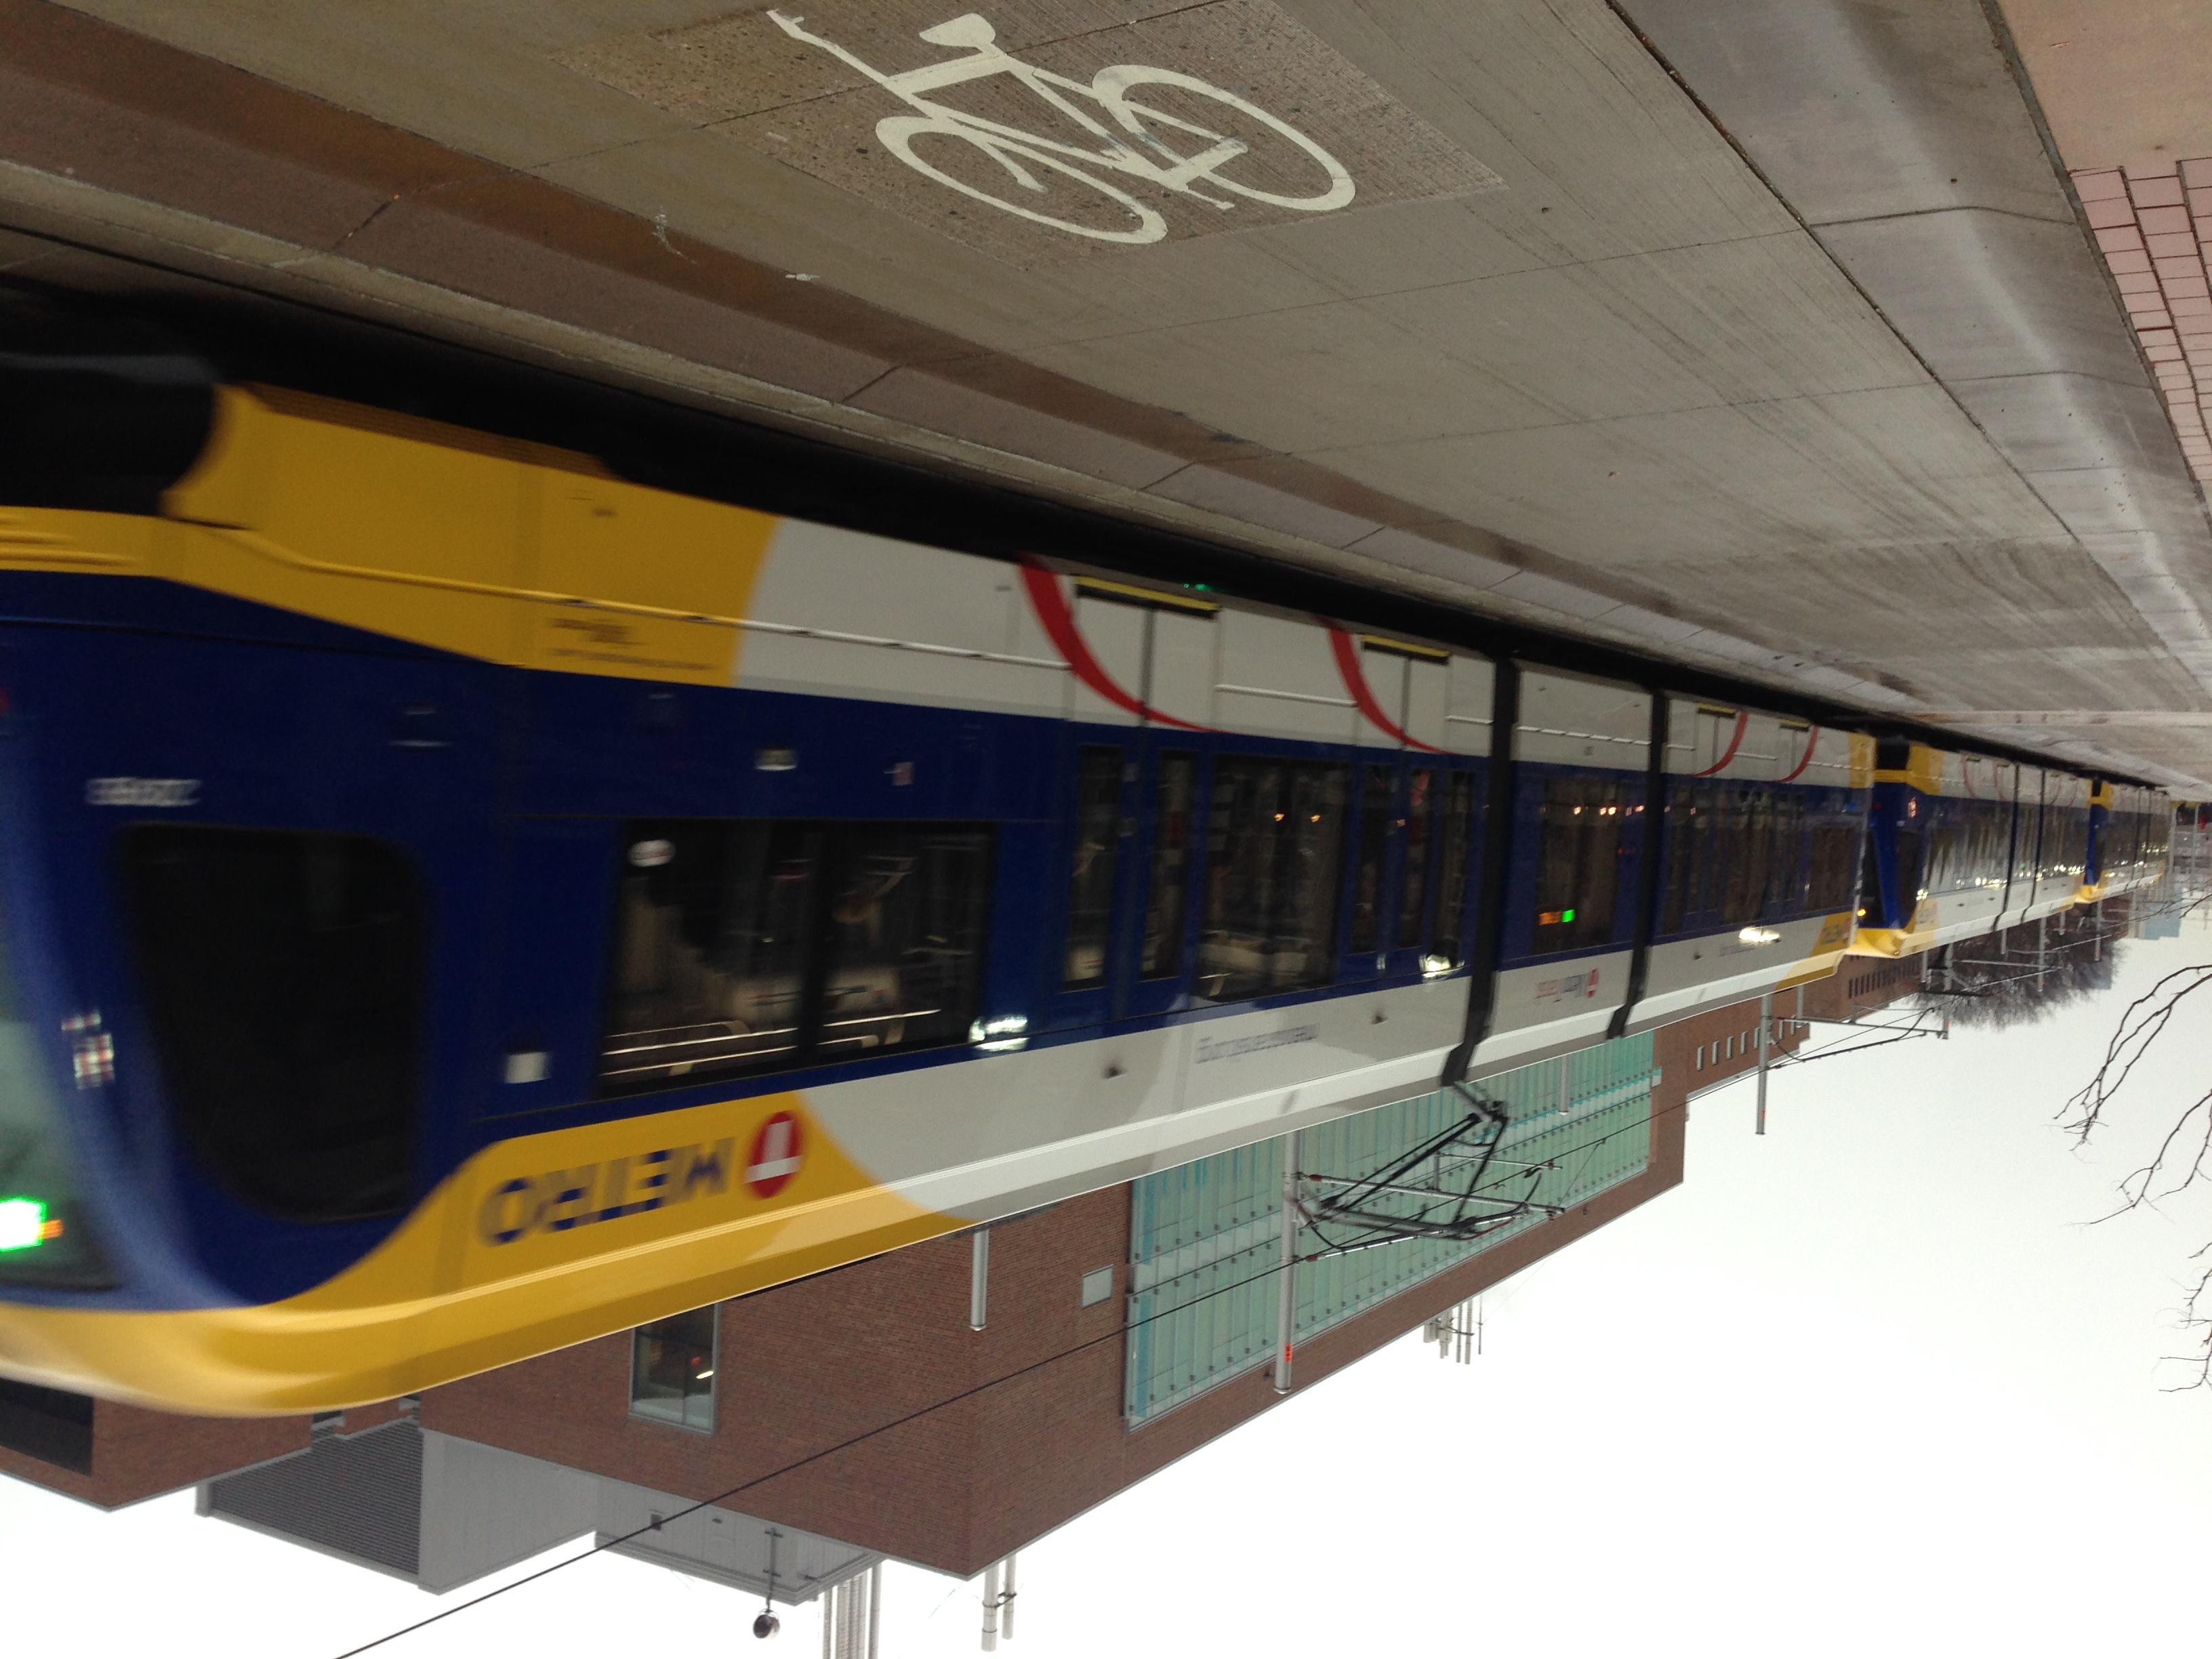 File:Metro Green Line near East Bank station.jpg - Wikimedia Commons